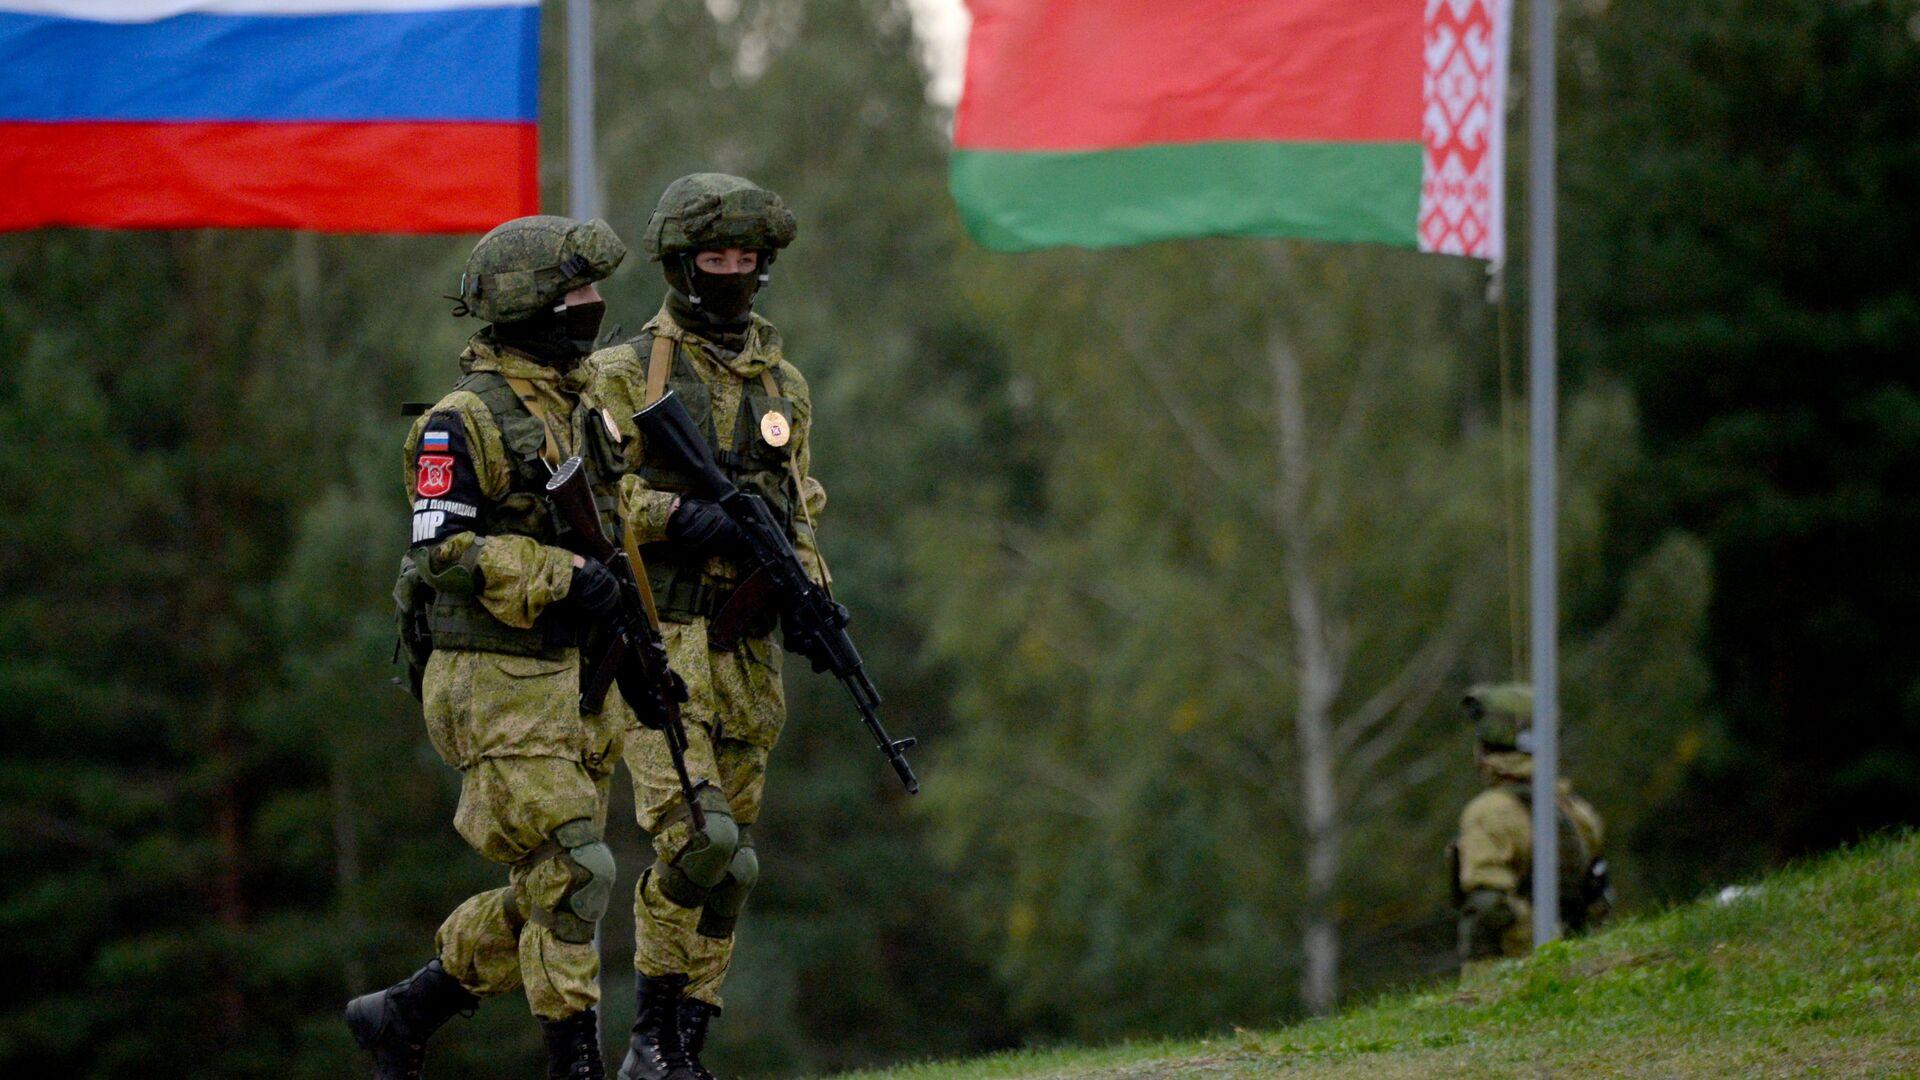 Rusko-beloruske vojne vežbe Zapad-2017  - Sputnik Srbija, 1920, 01.06.2021